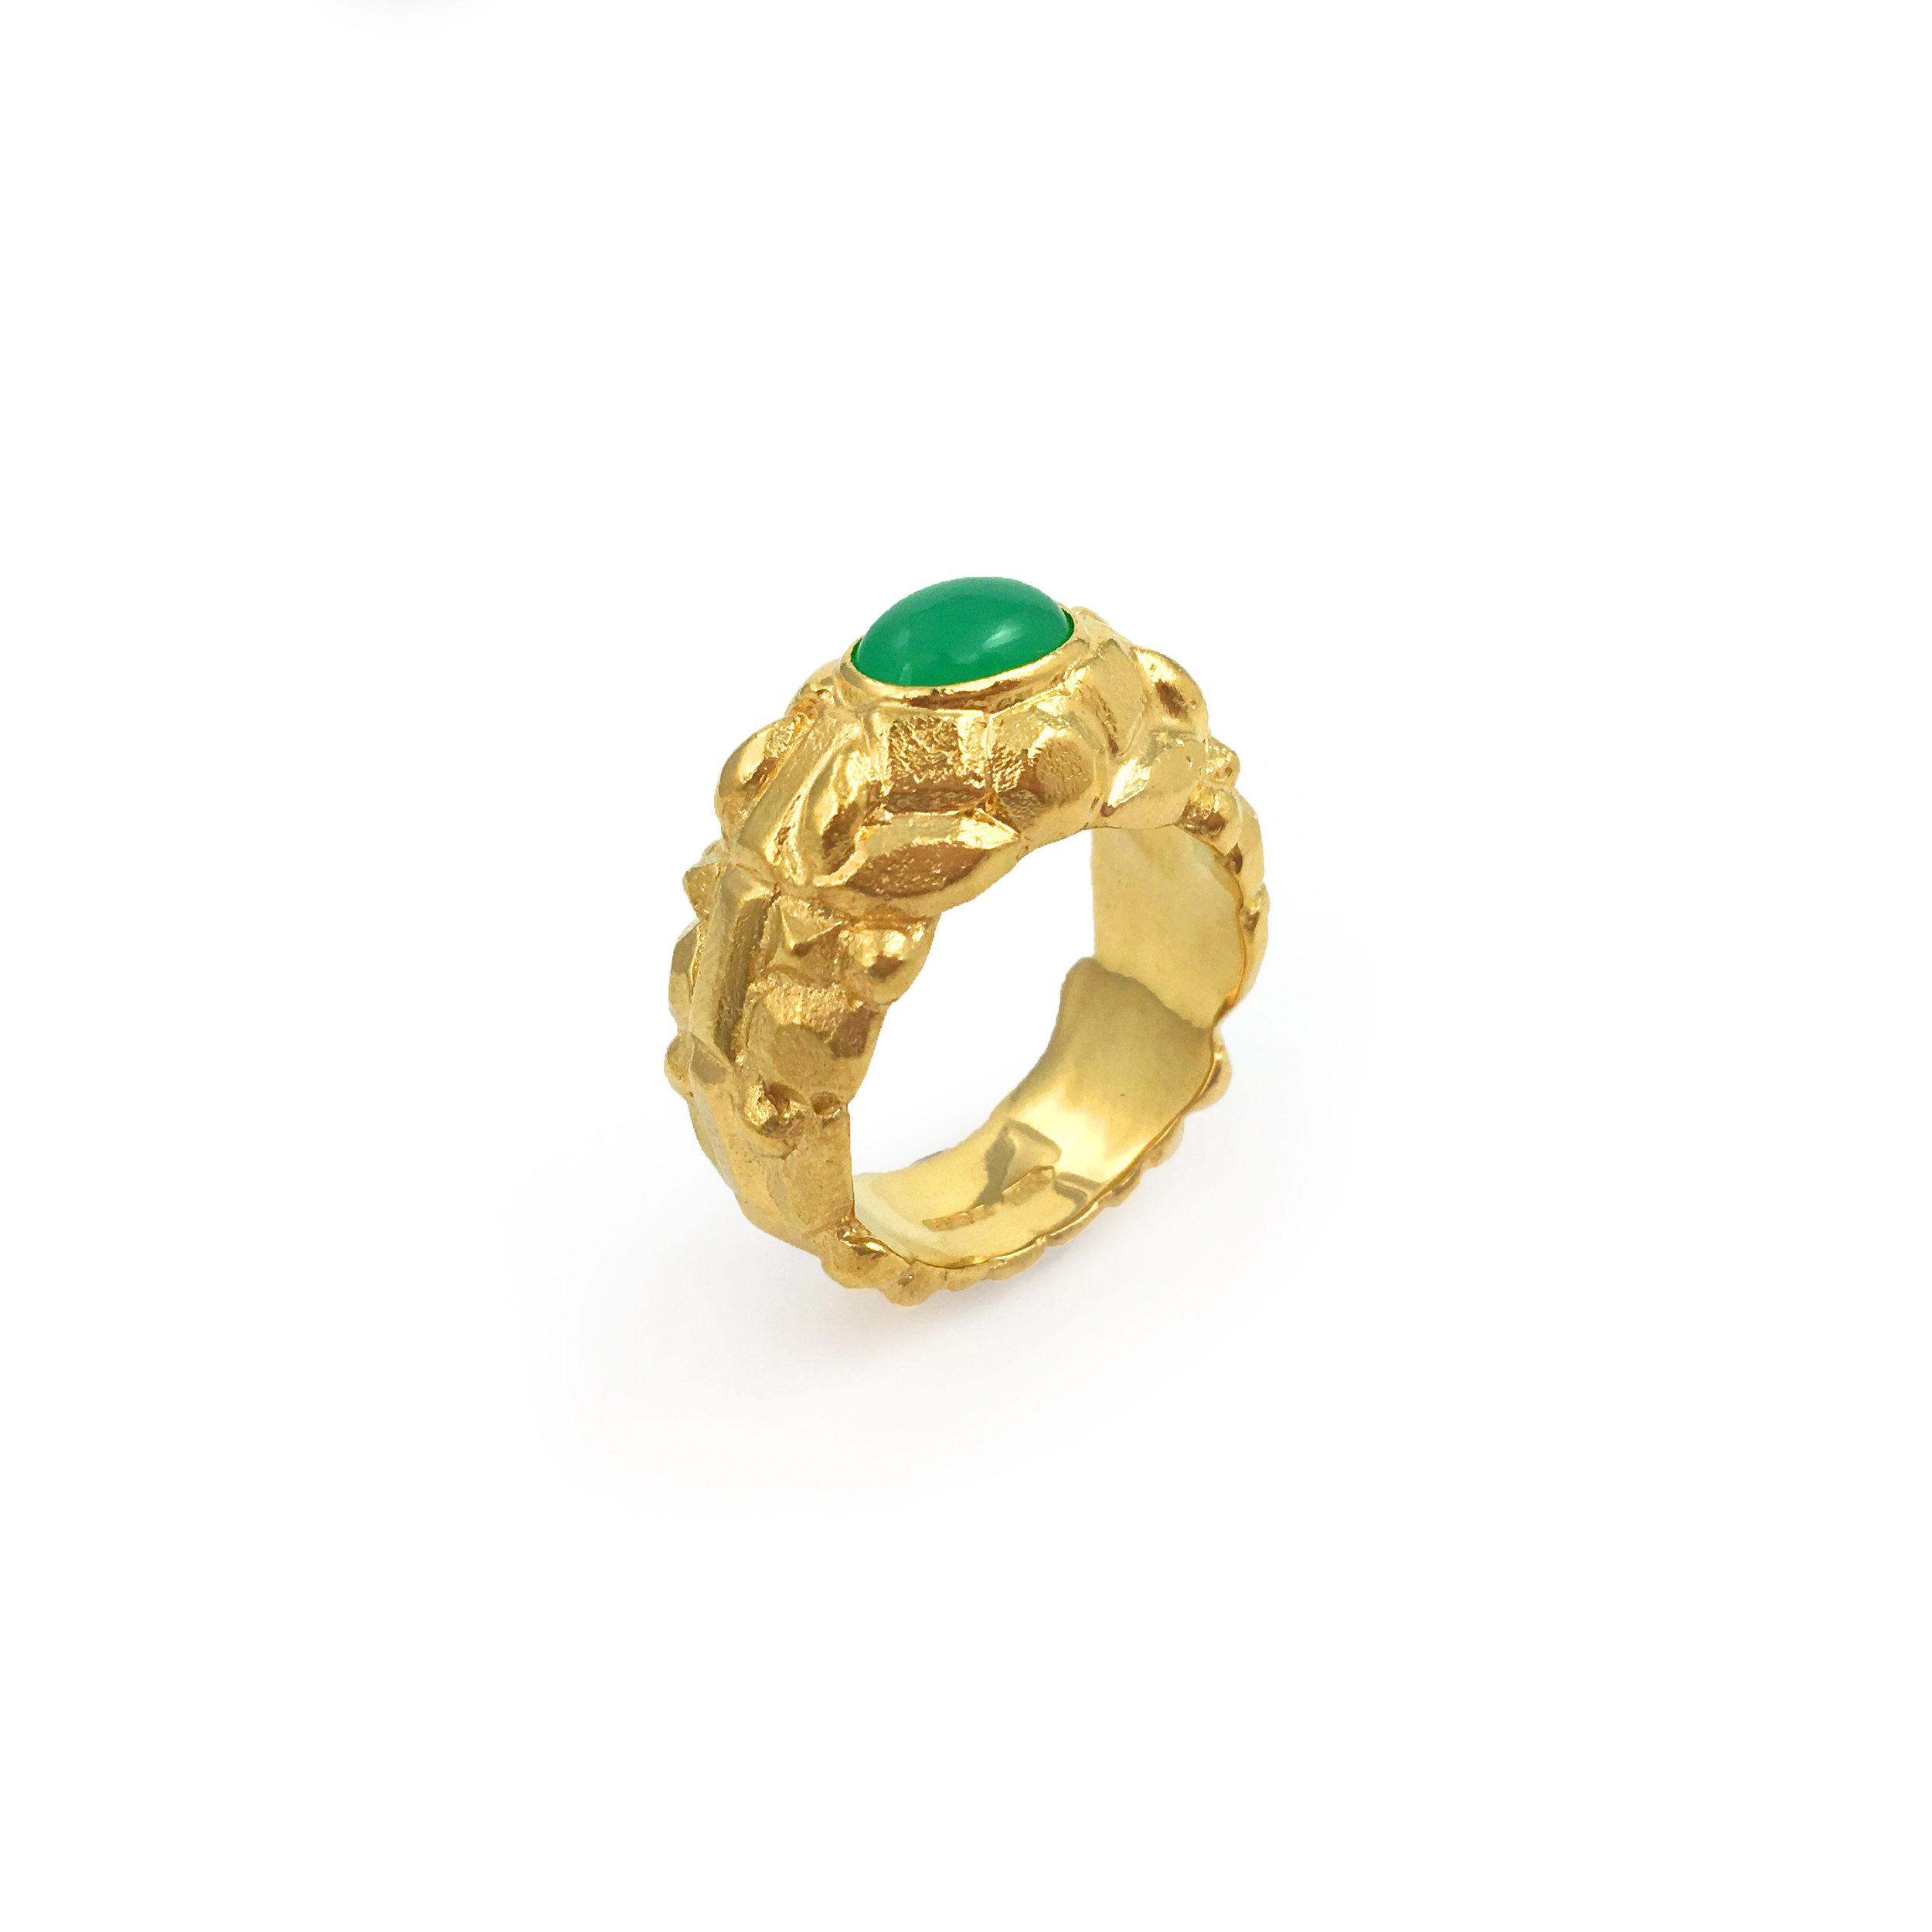 Nour Ring with Chrysoprase.jpg